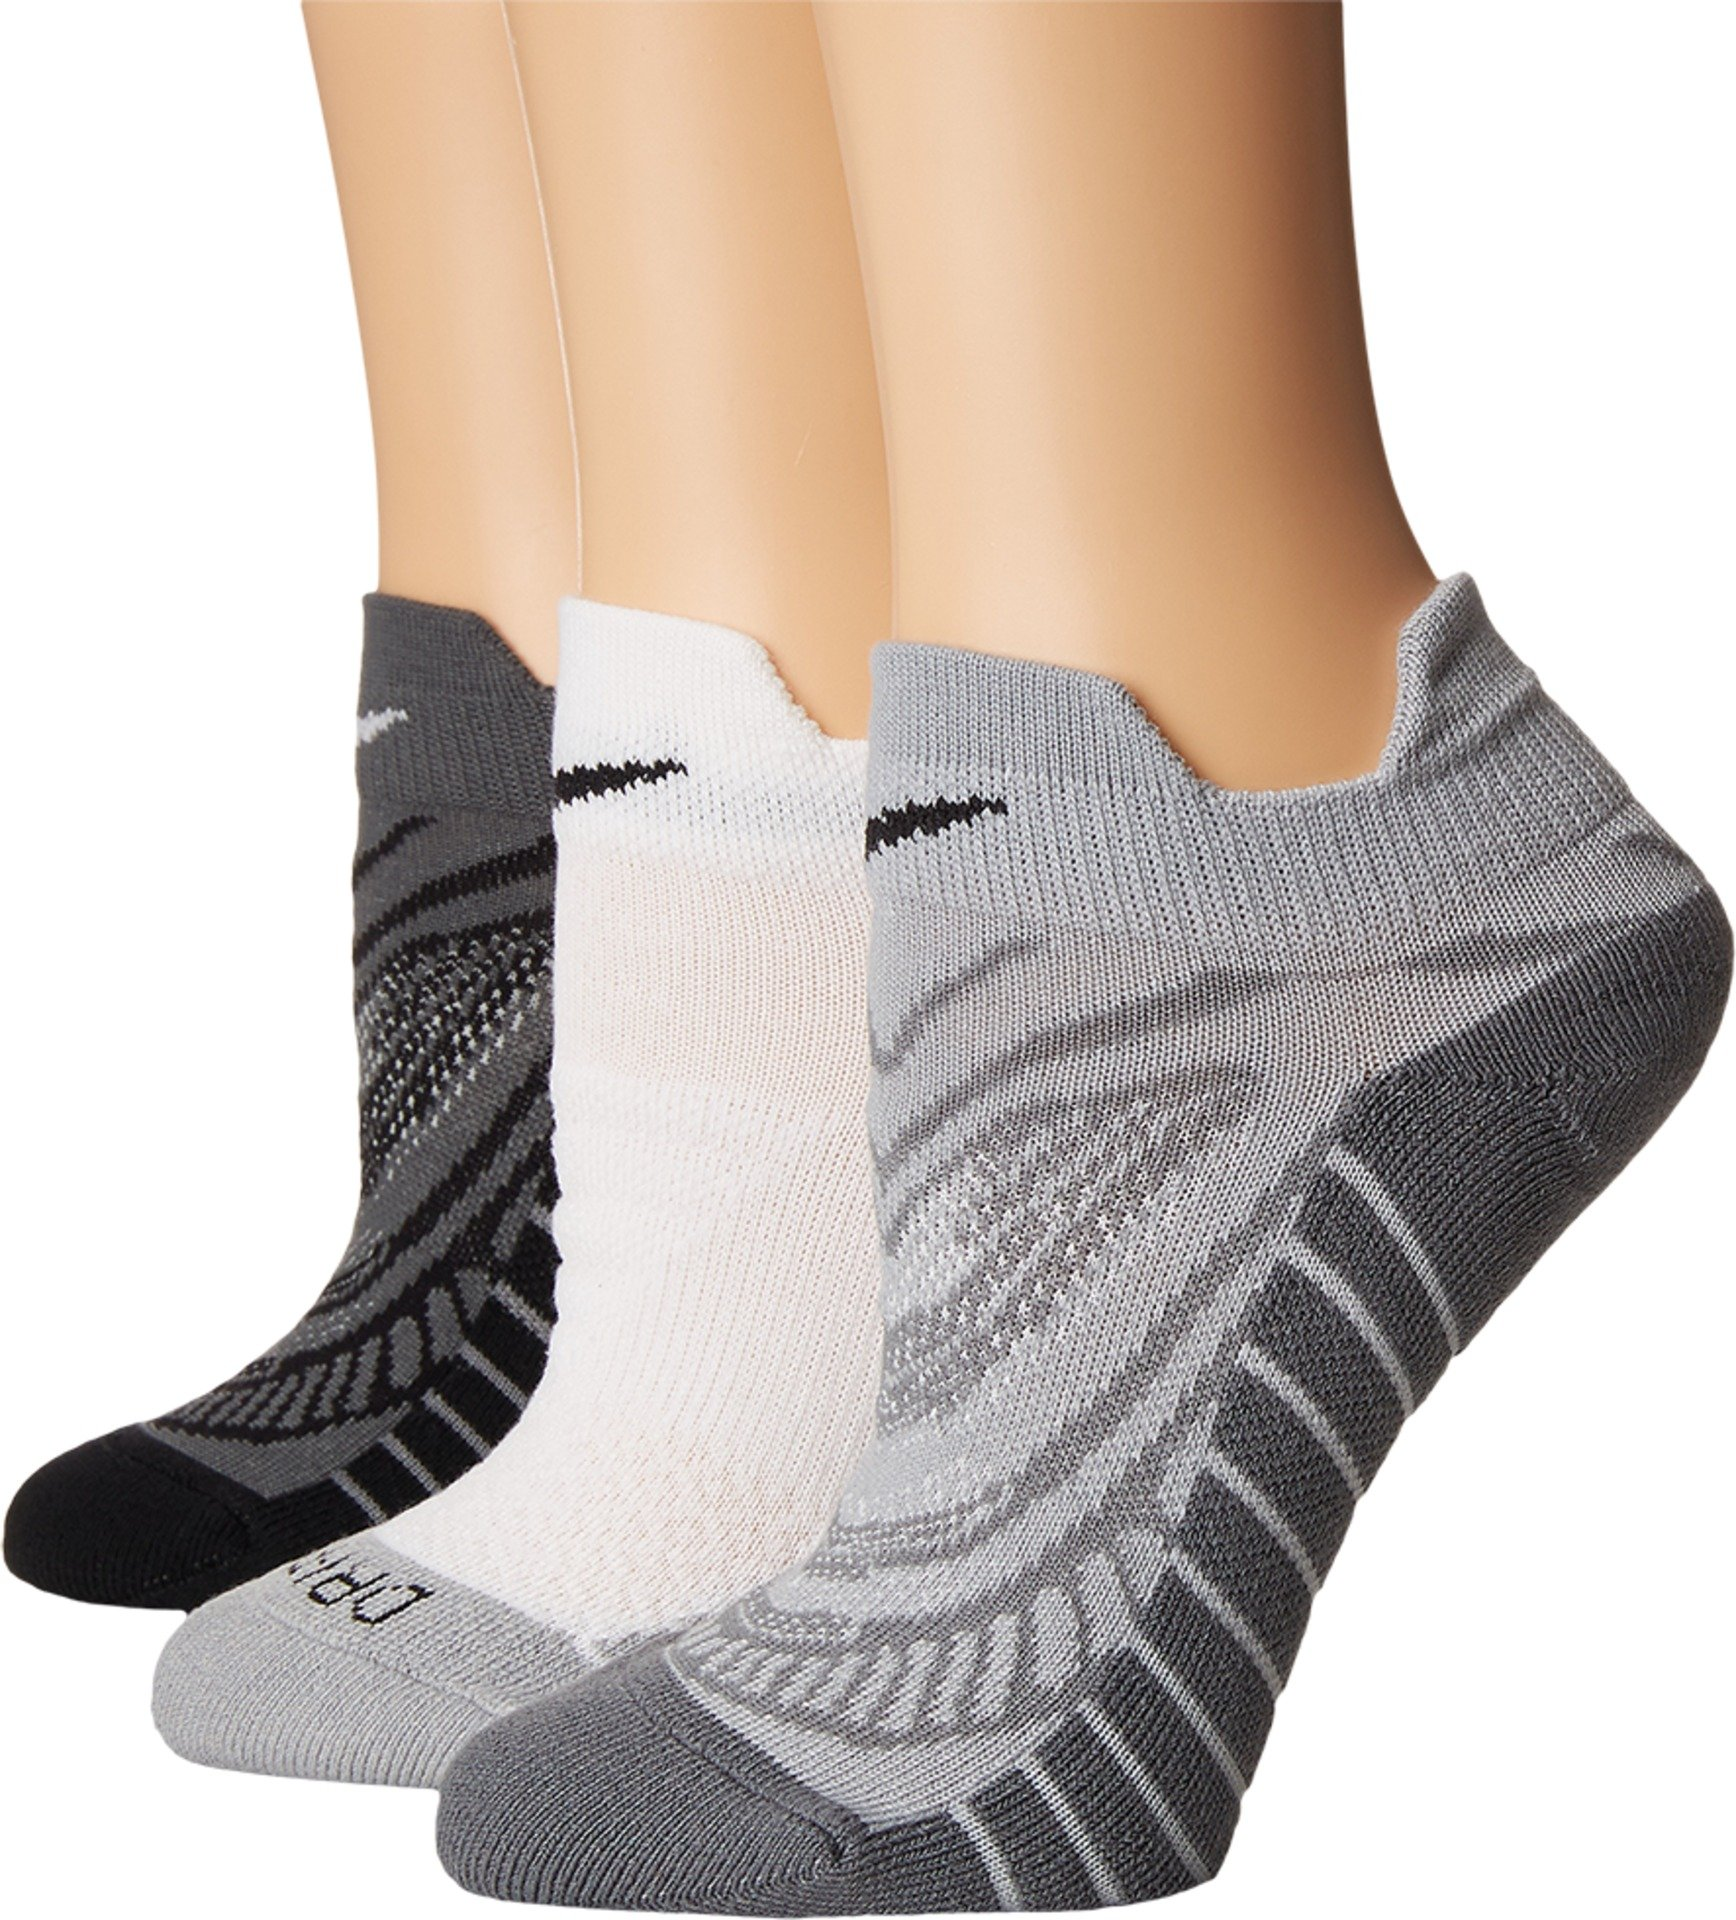 Nike Women`s Dry Cushion Graphic Low Training Socks (3 Pair) (Multicolor 4, Medium)